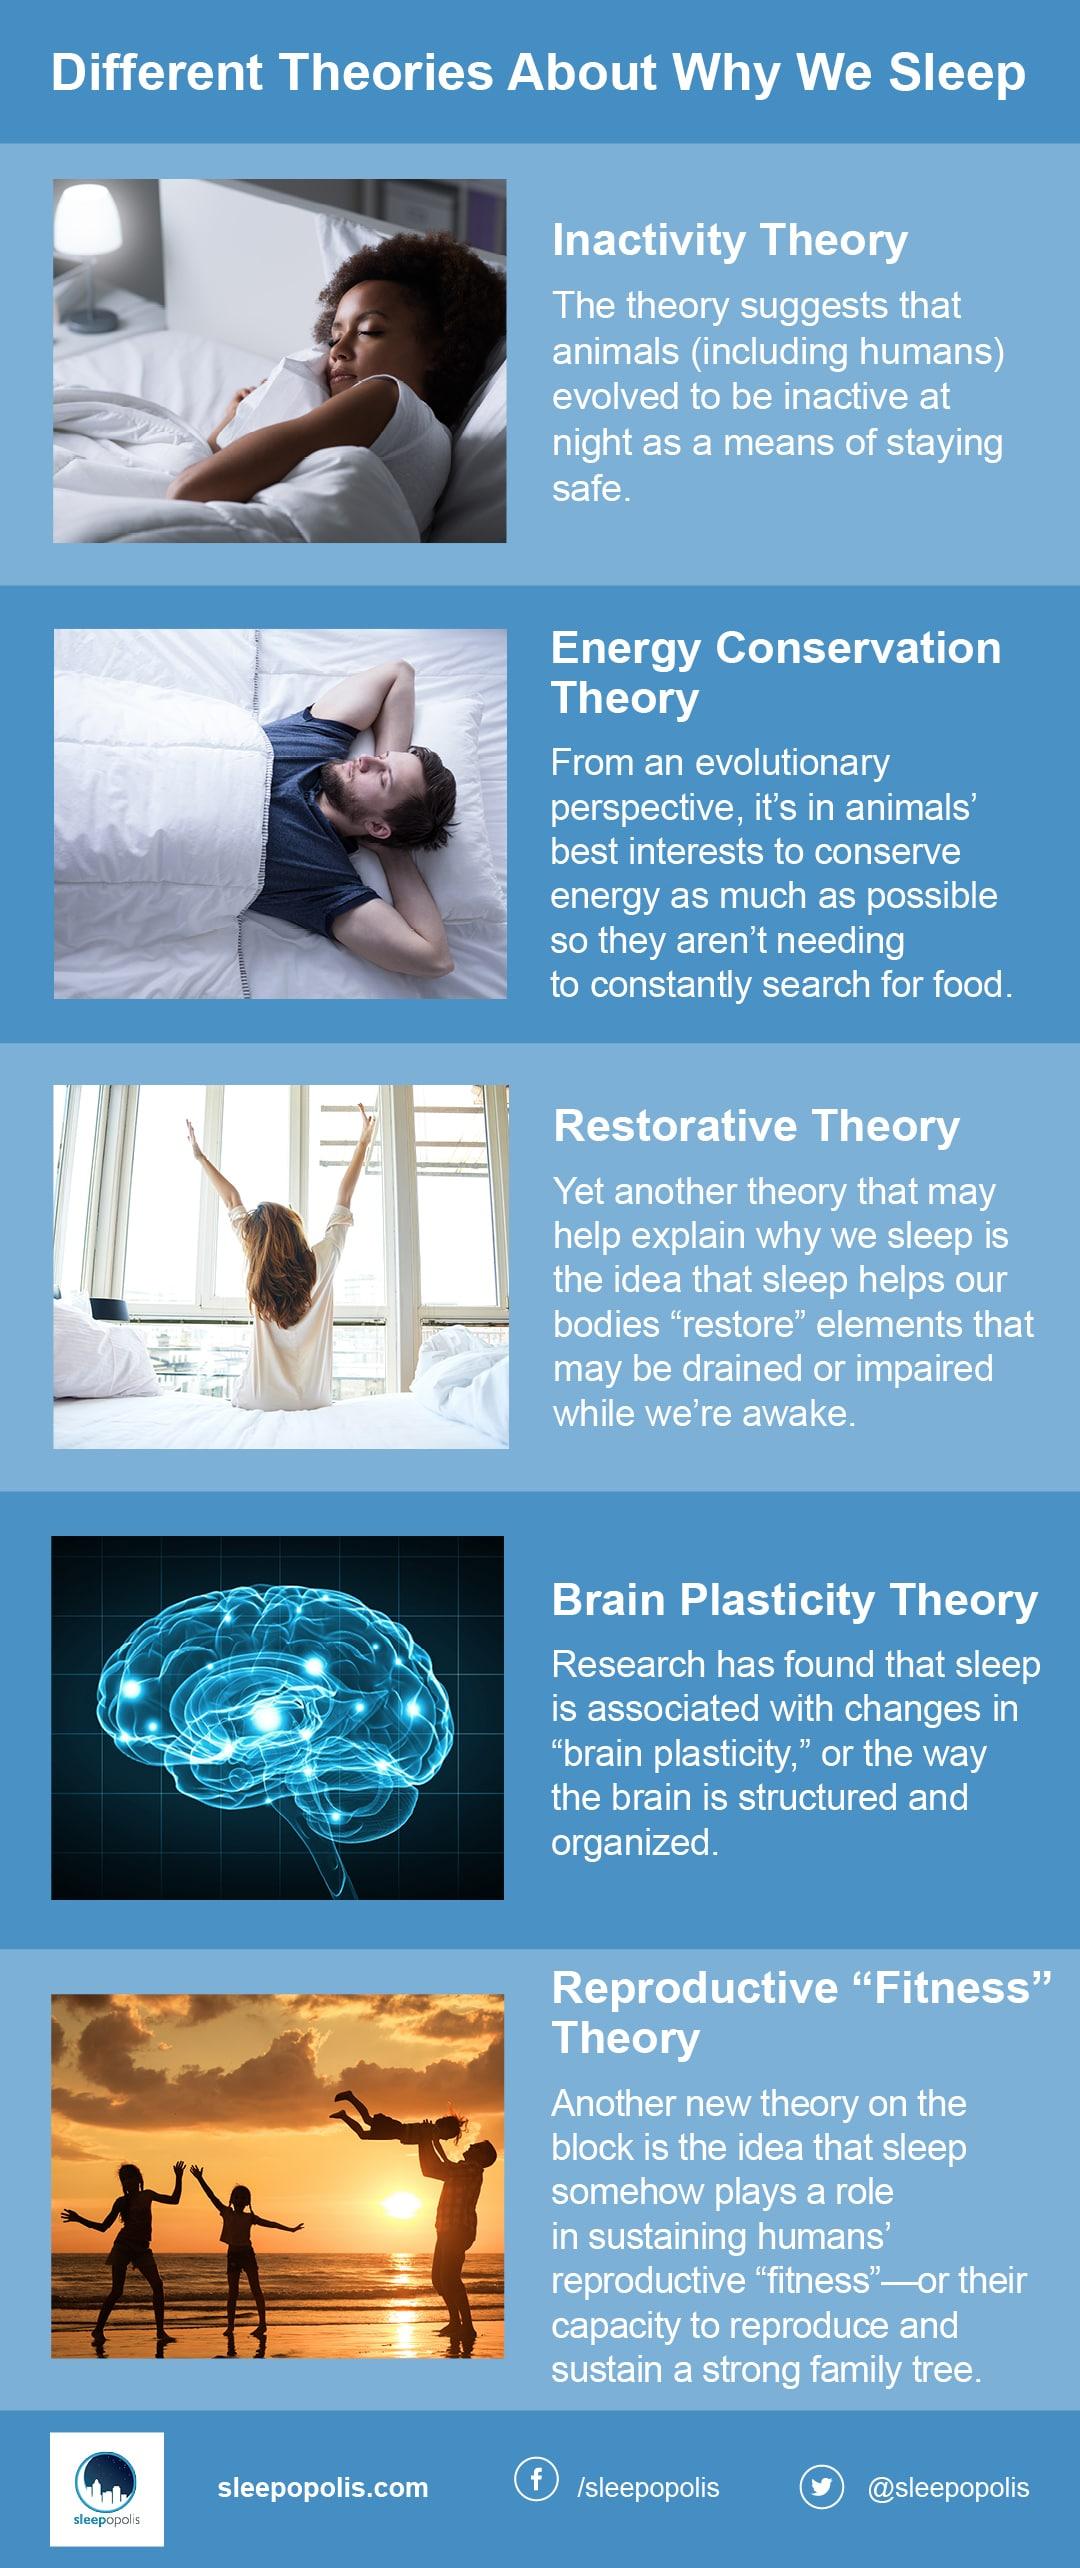 restorative theory of sleep